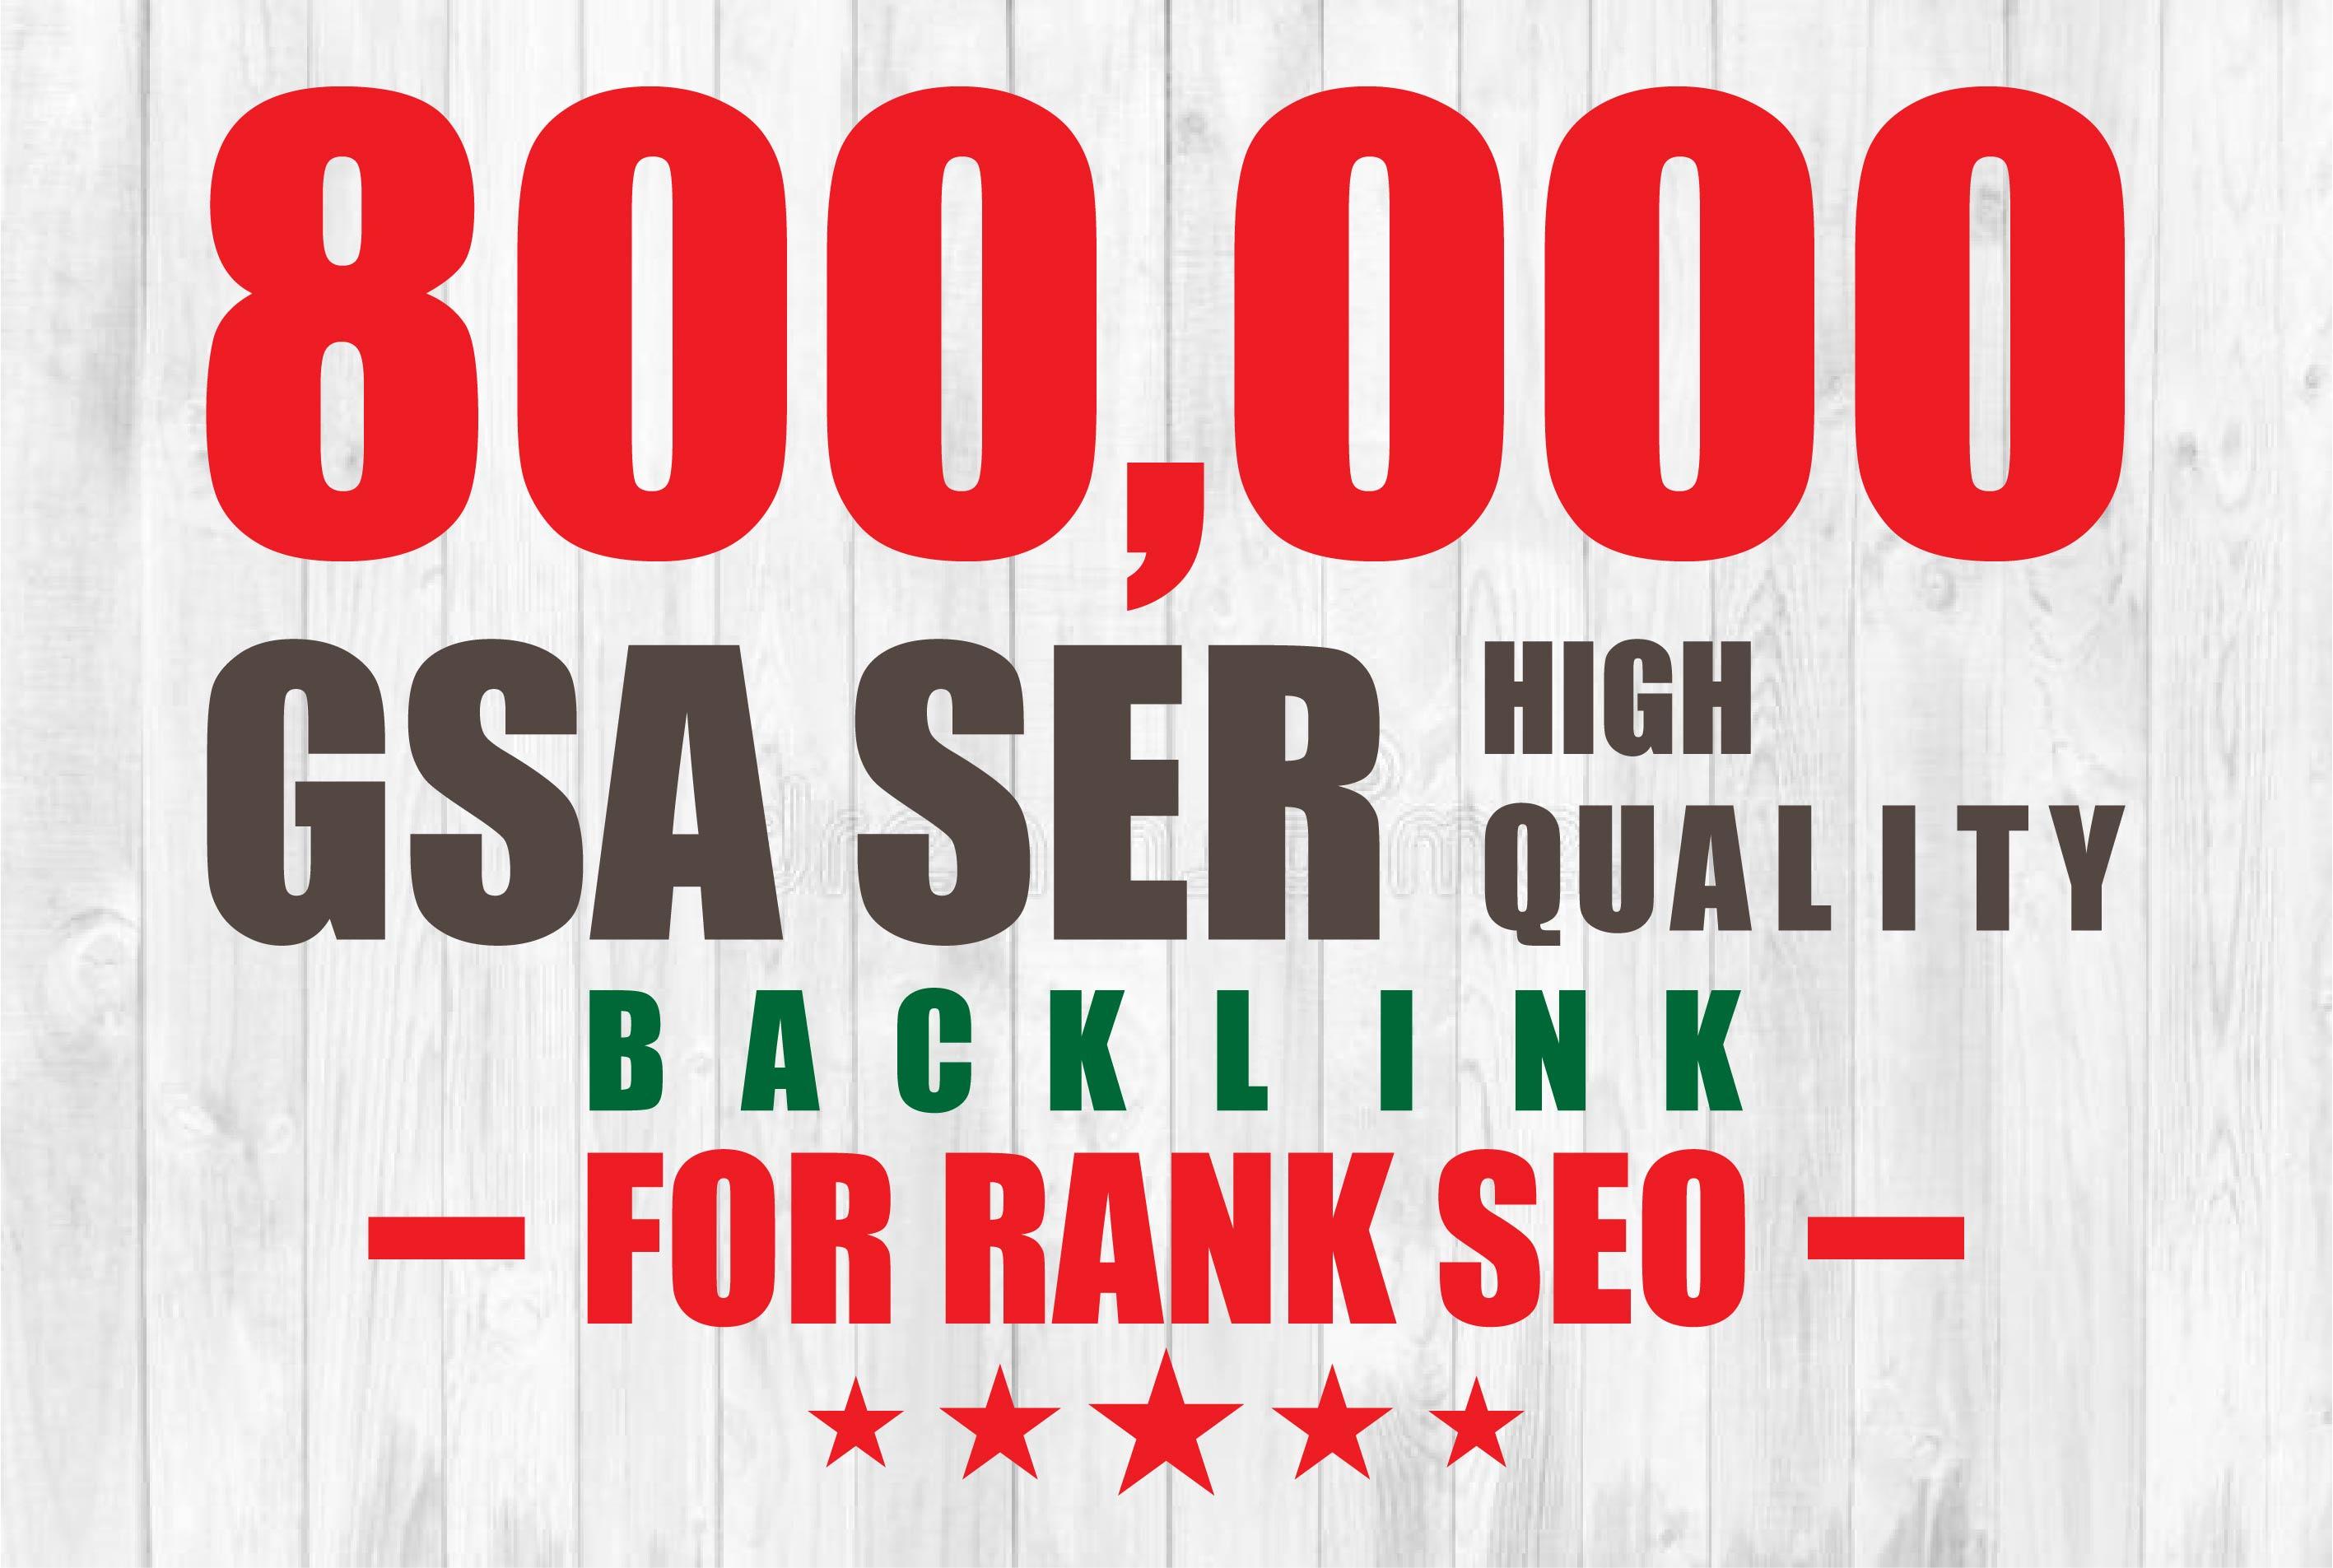 I will create 800k gsa ser verified HQ backlinks for rank your website, youtube etc